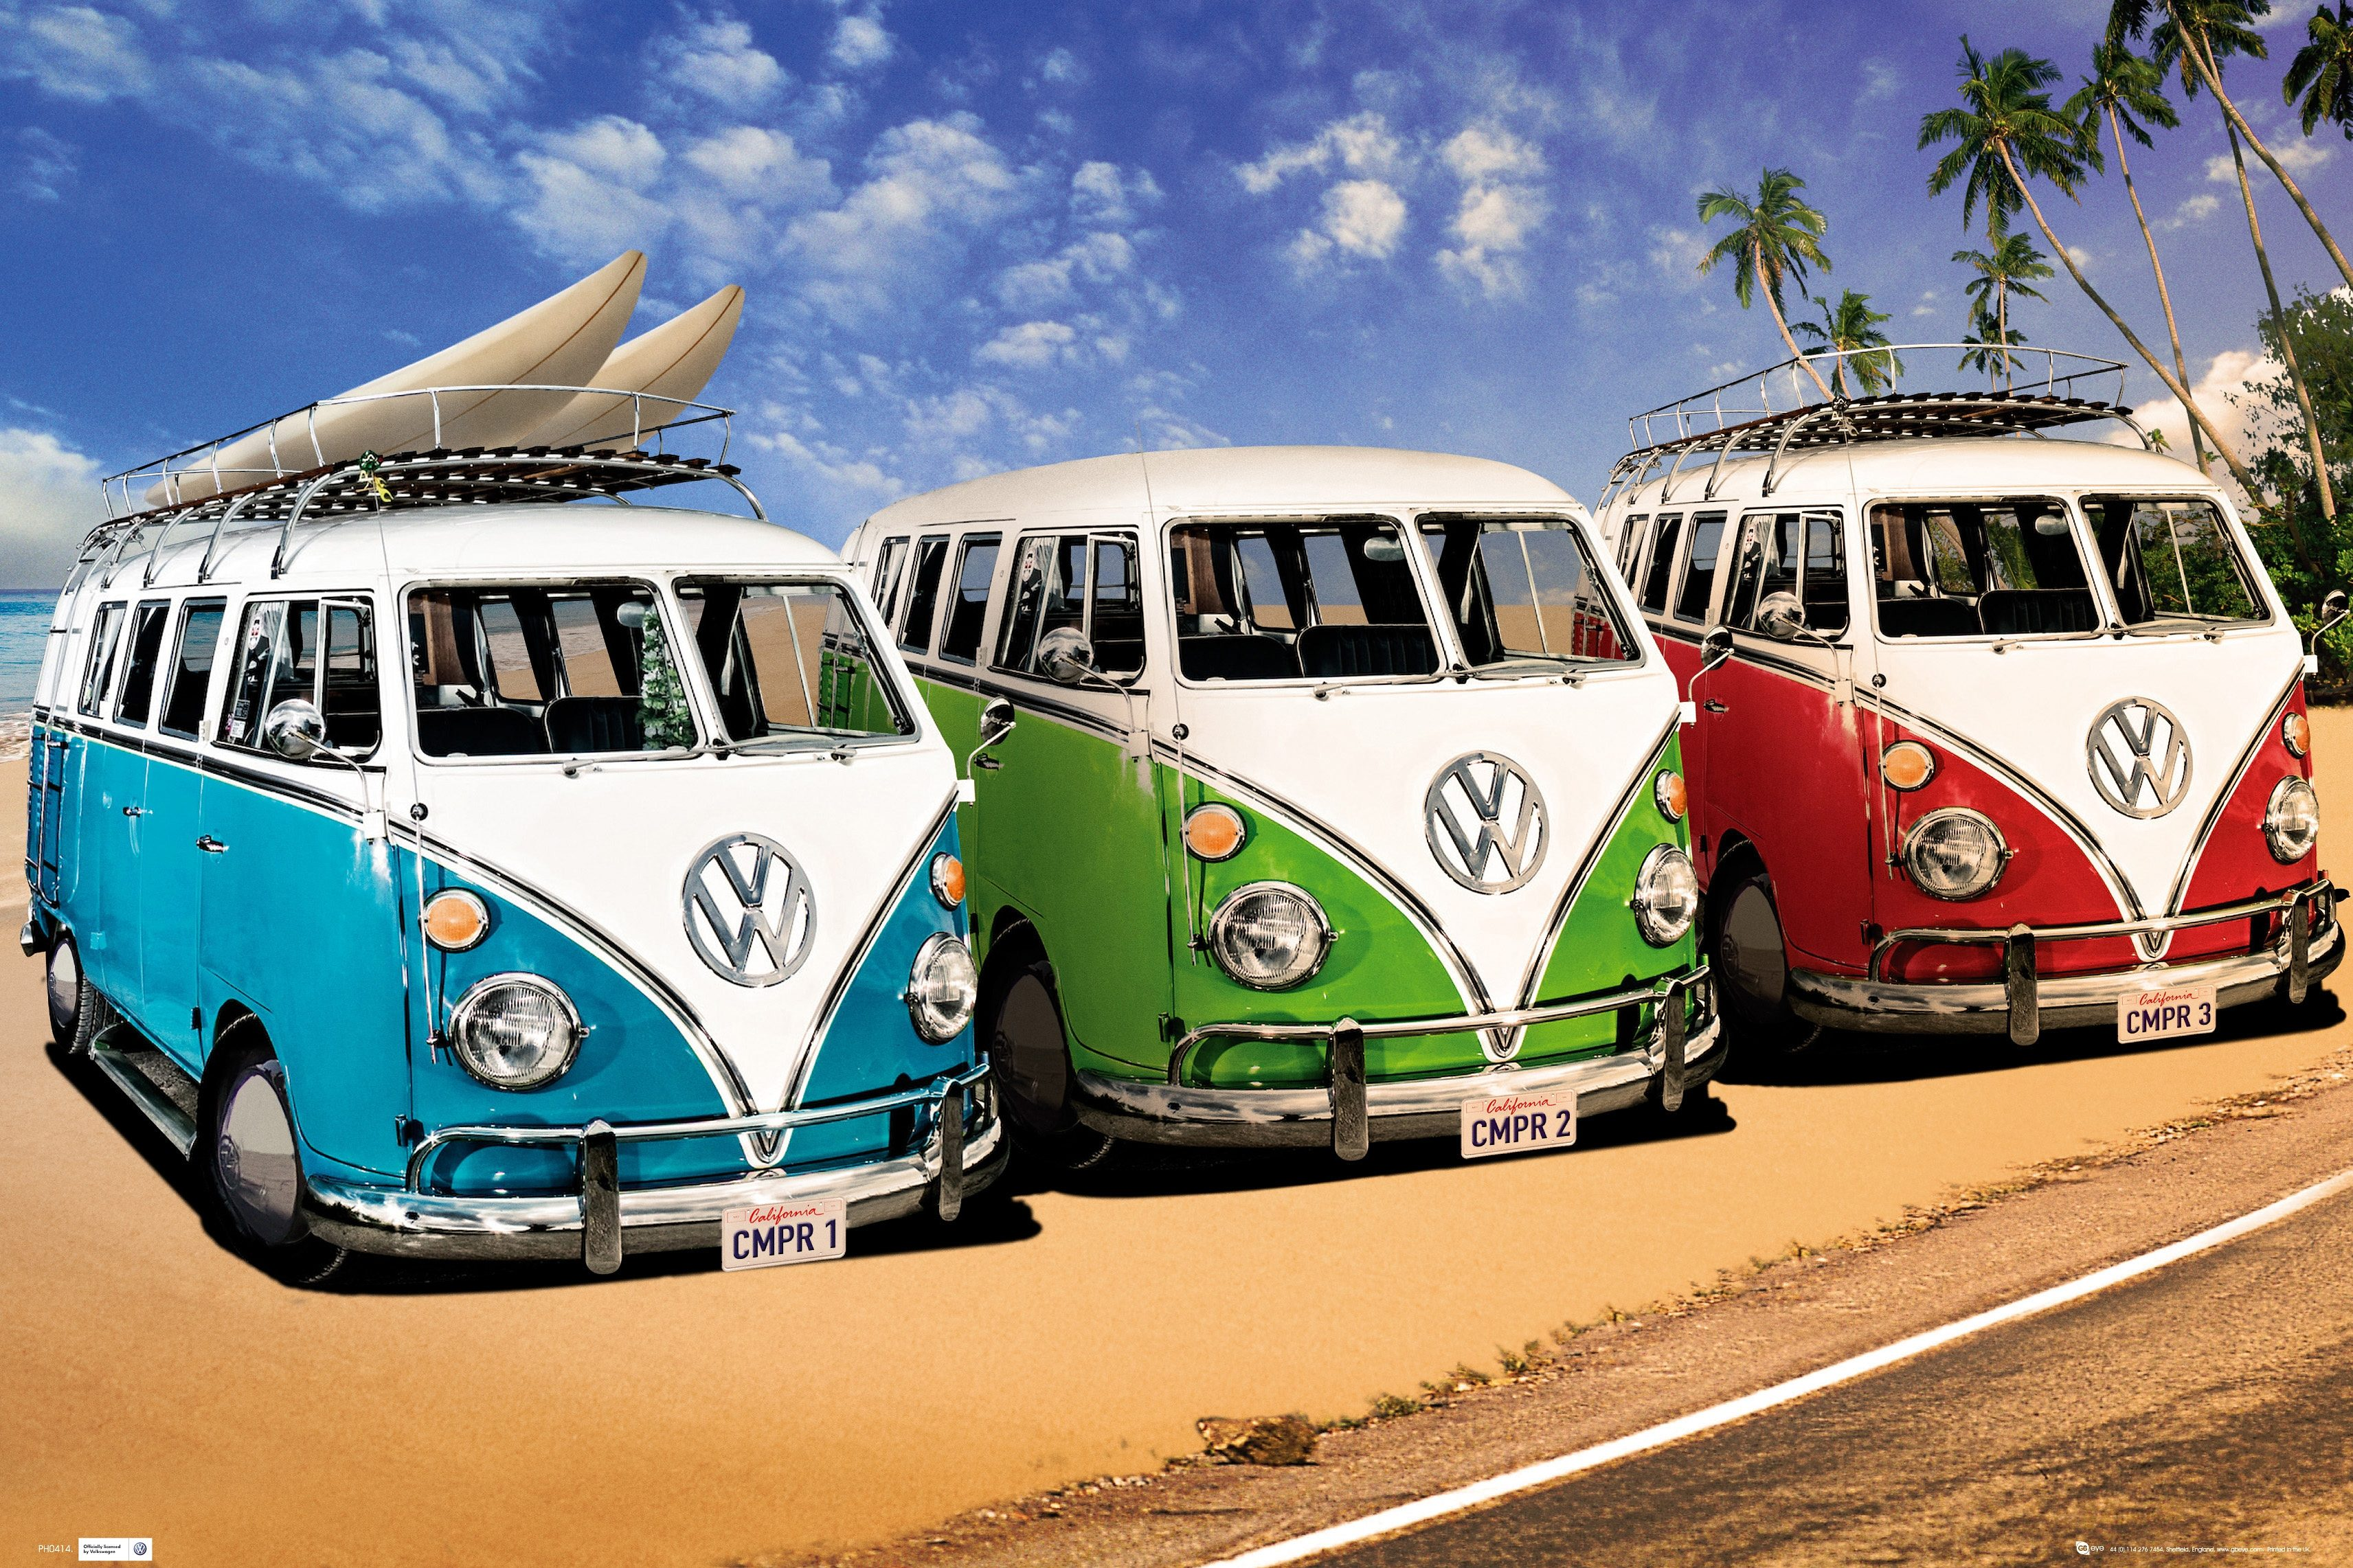 Bild, Home affaire, »VW Californian Camper - campers«, 90/60 cm